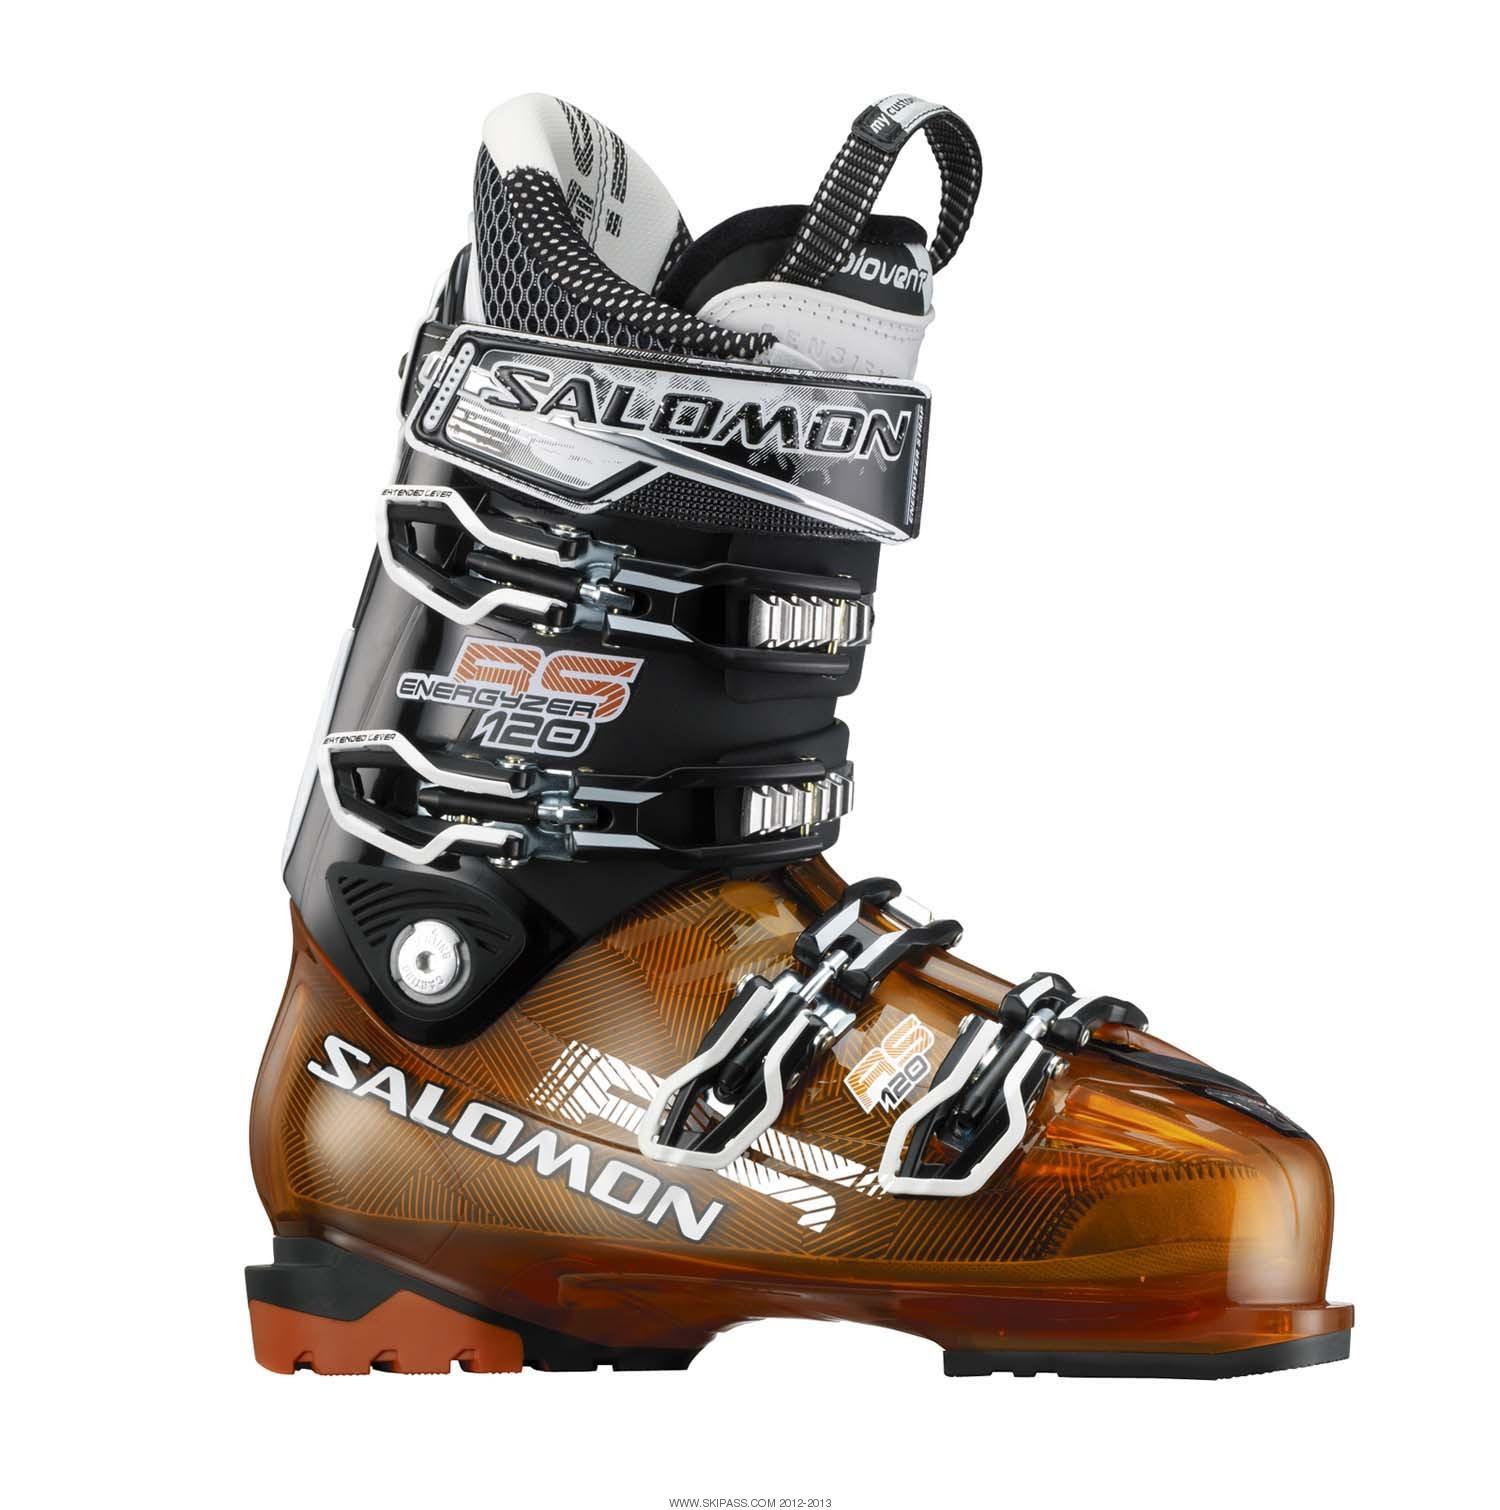 De 120 Cs Ski Impact Salomon Chaussure rCQdBoxeW